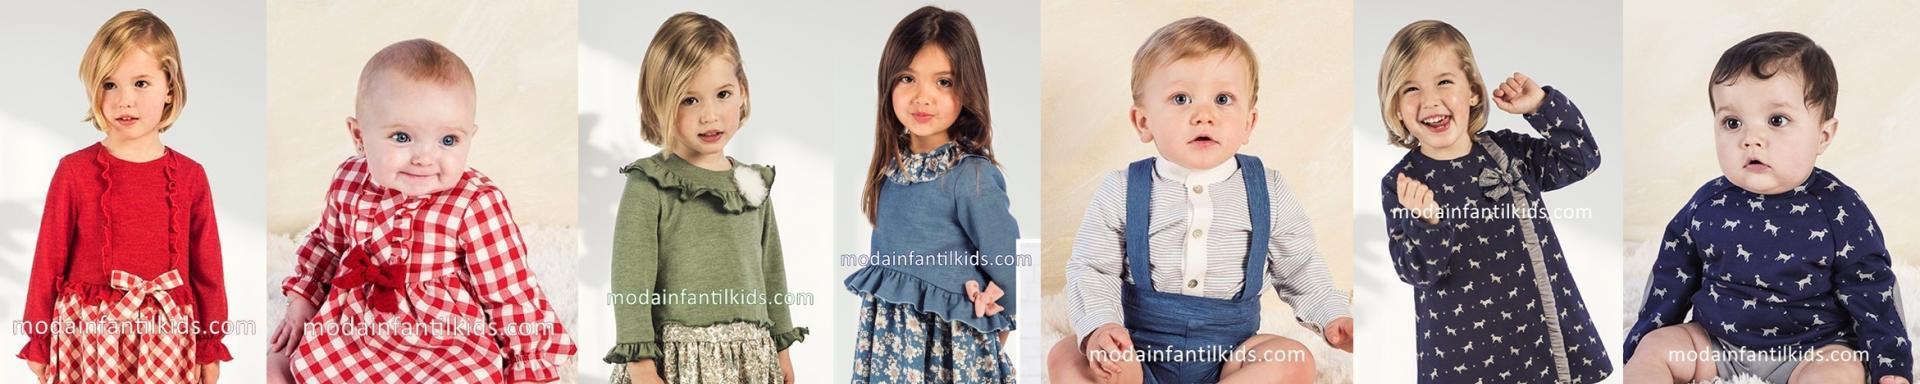 Kids Moda Infantil Moda Infantil Otoño-Invierno 2020-2021